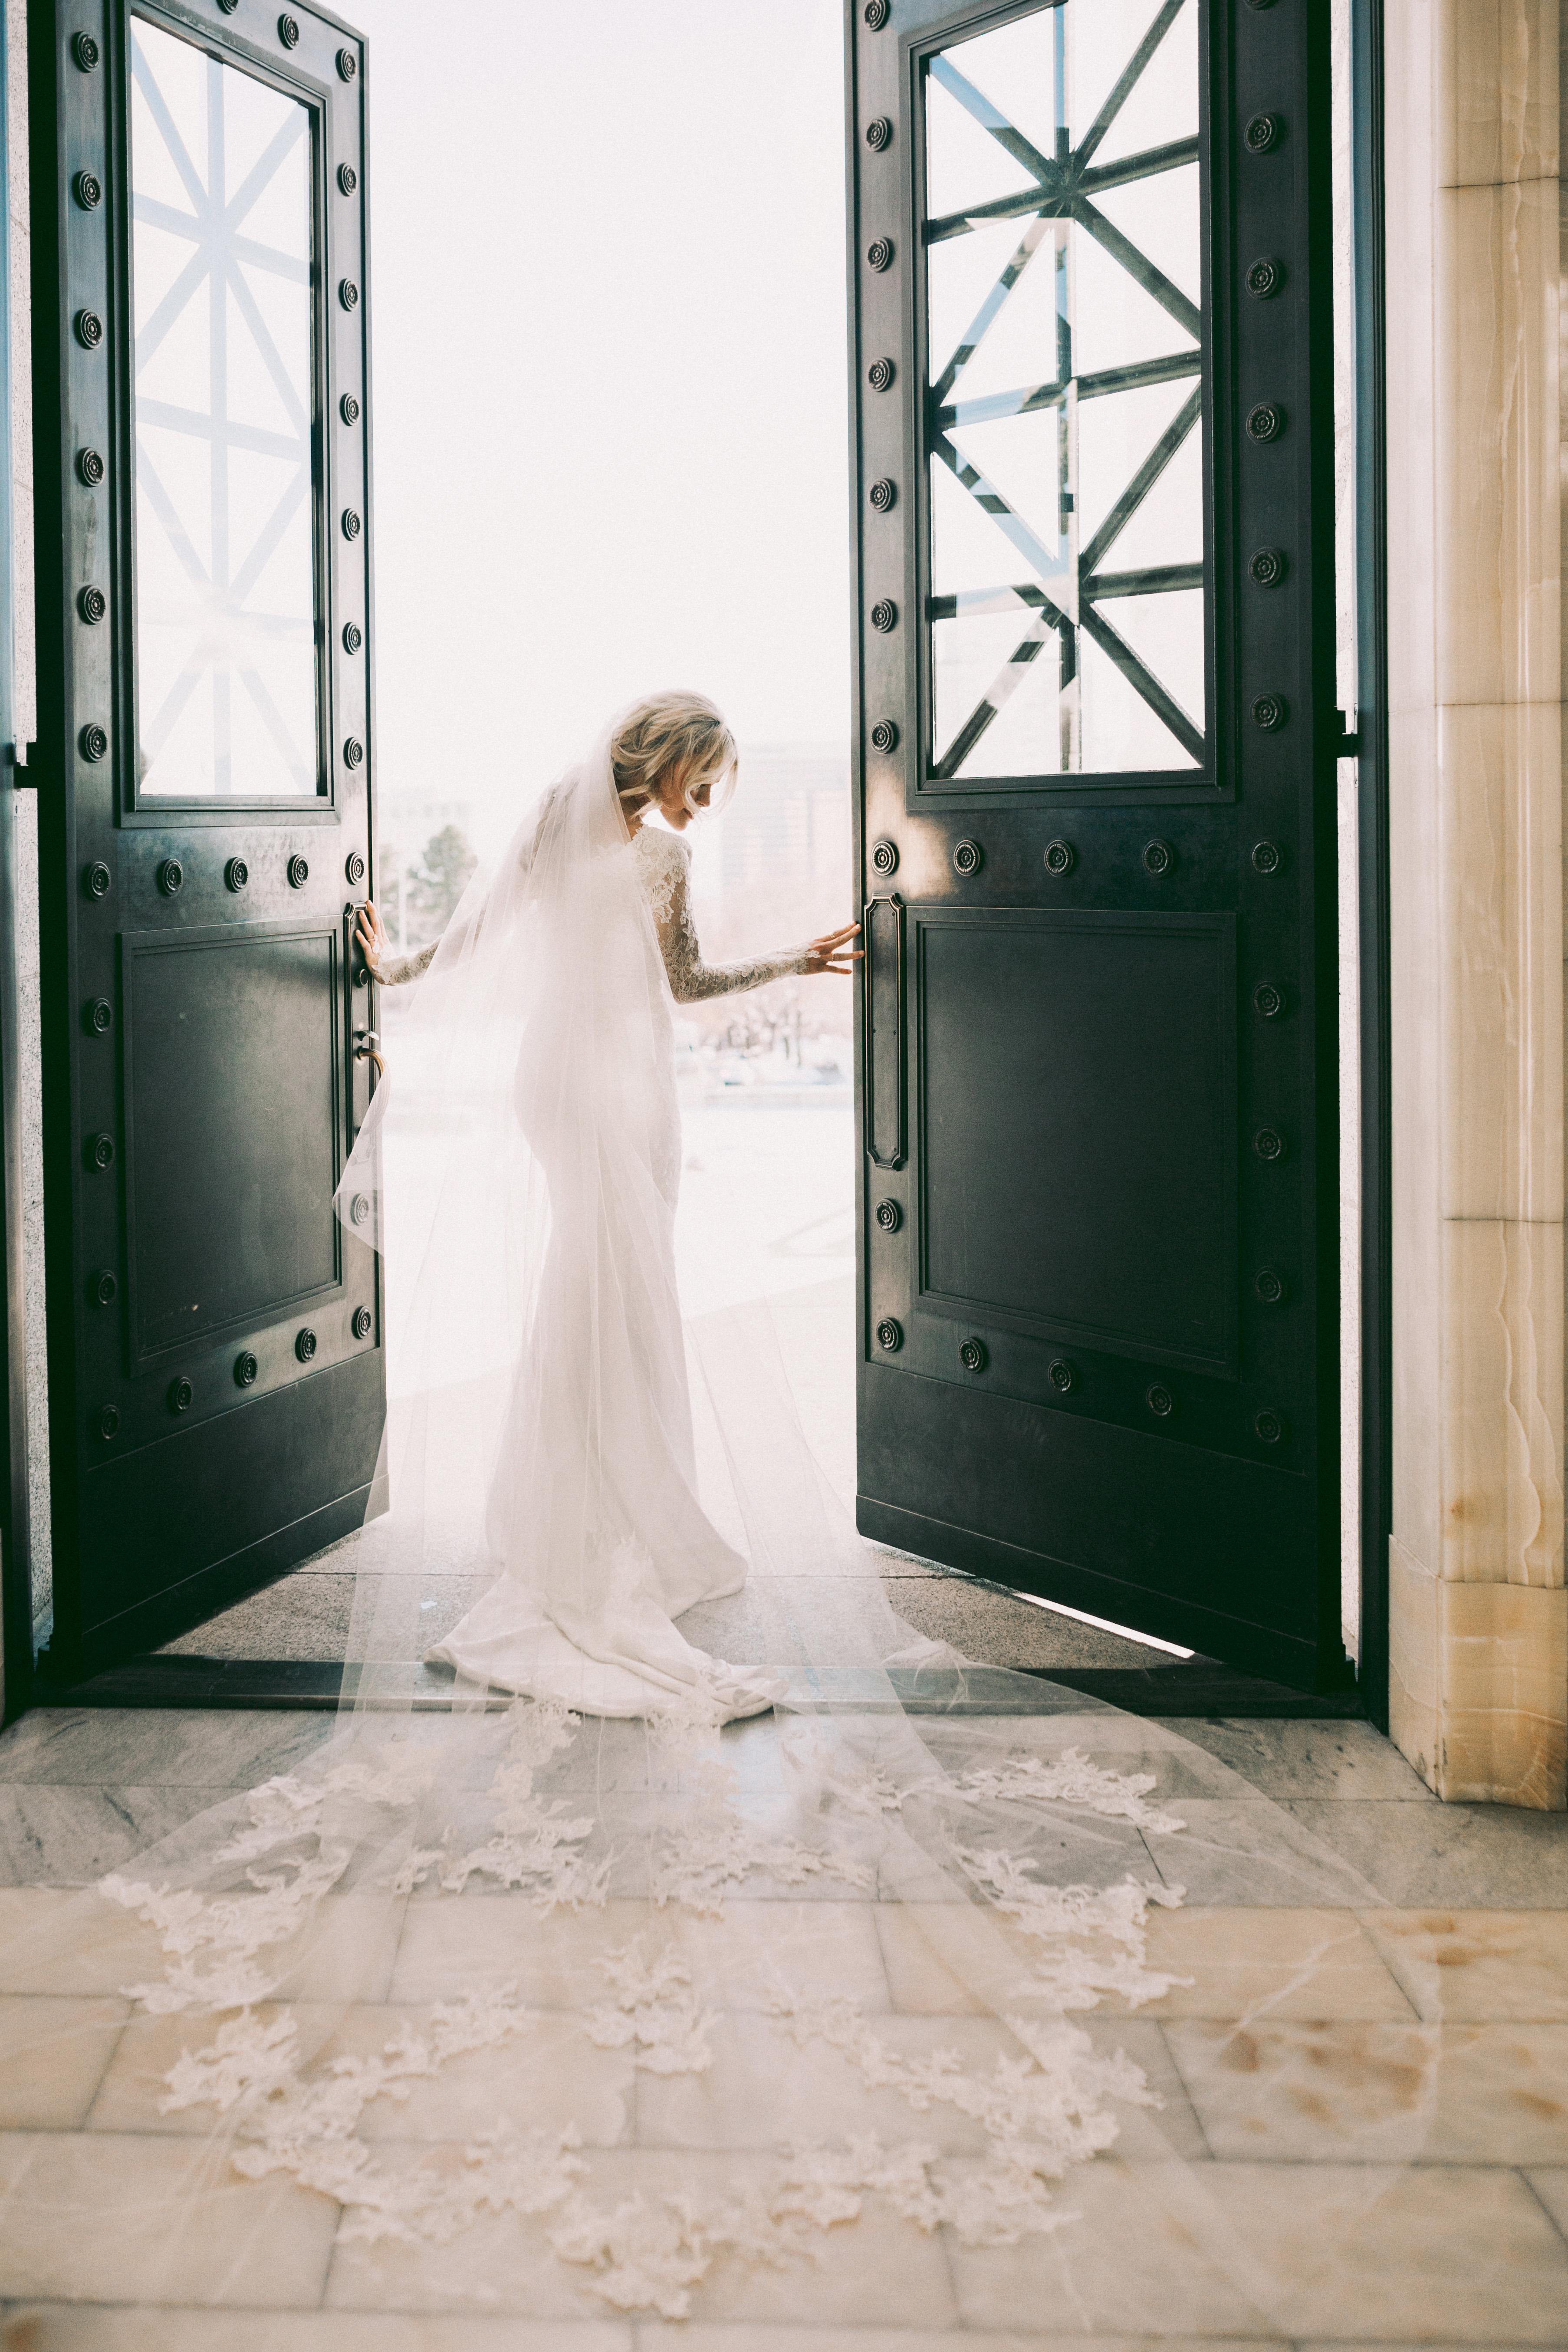 witney_carson_bridals_1024